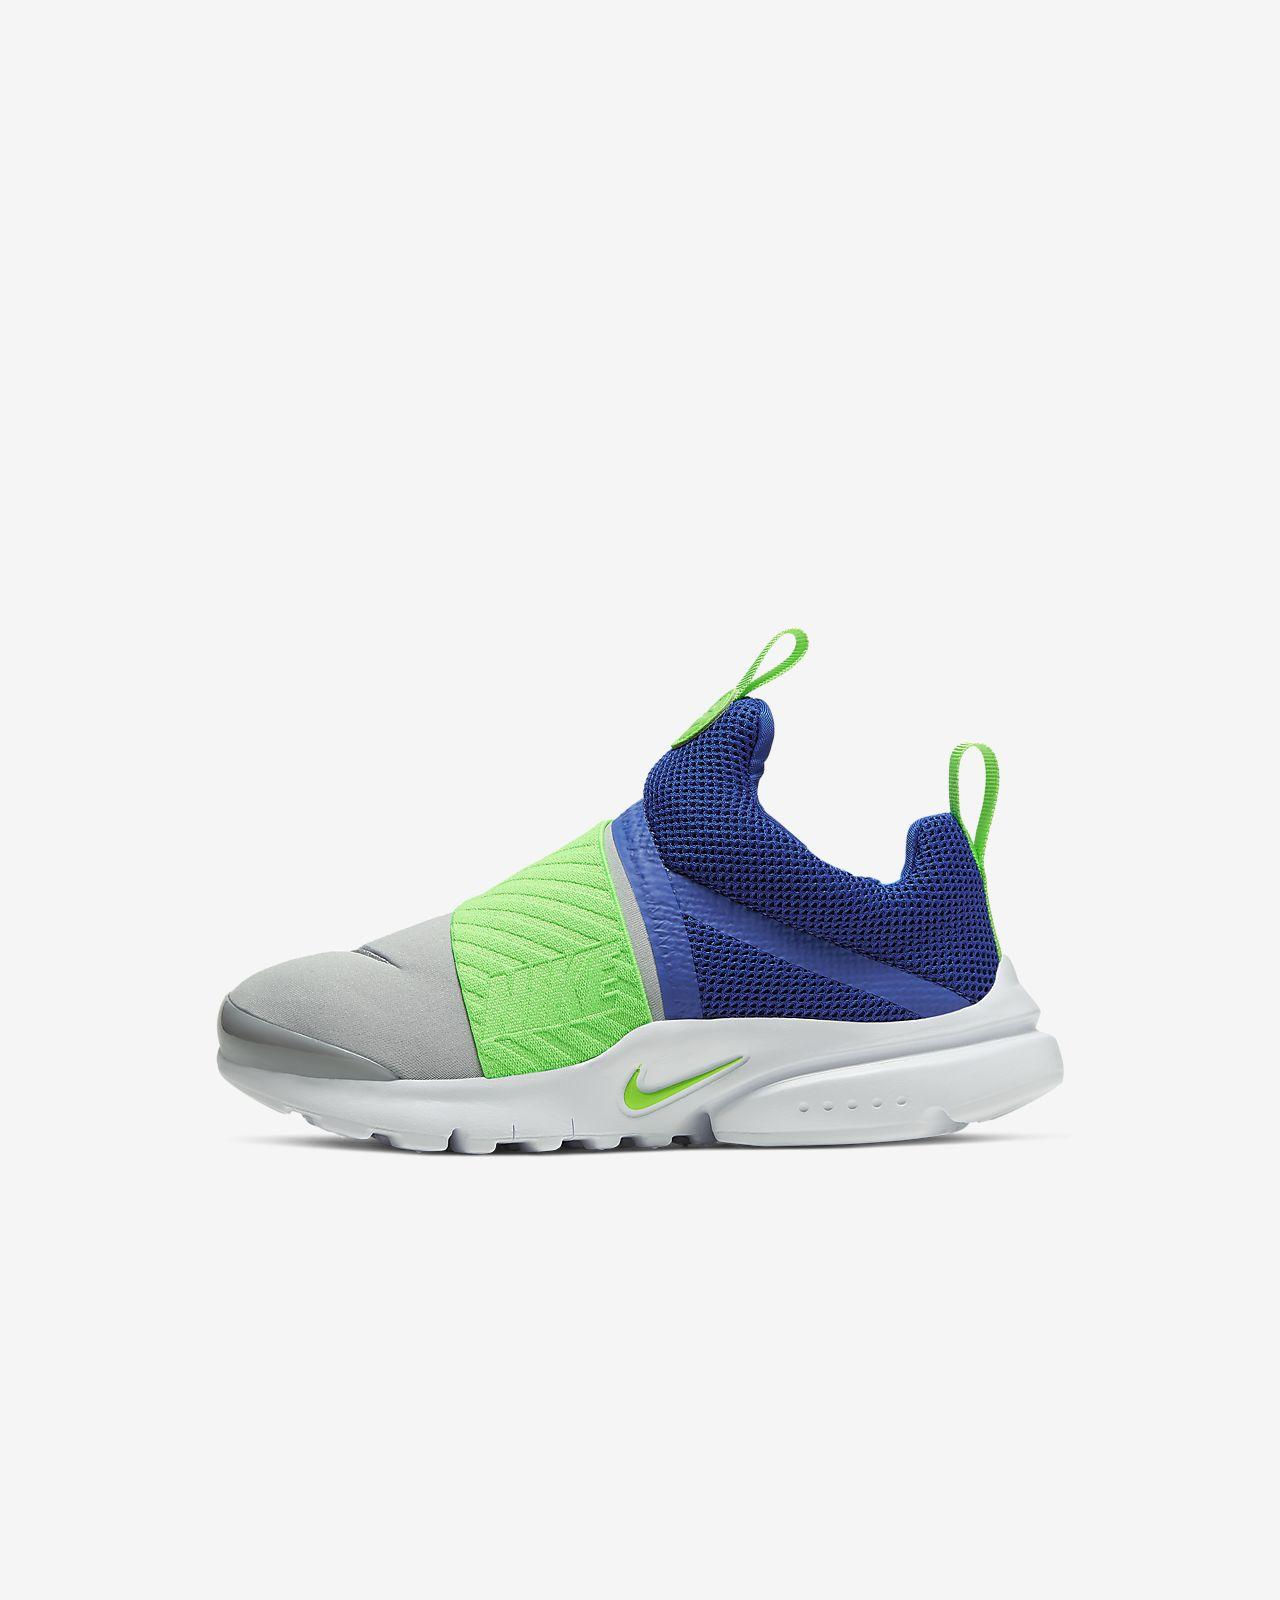 check out 5dc6e 93c5c ... Nike Presto Extreme Little Kids  Shoe